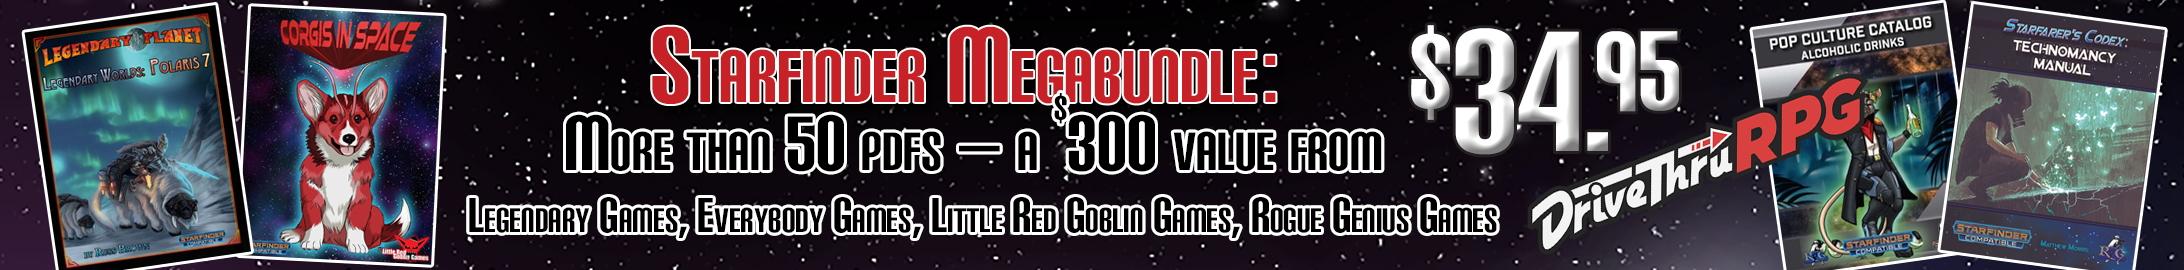 Starfinder Megabundle @ DriveThruRPG.com